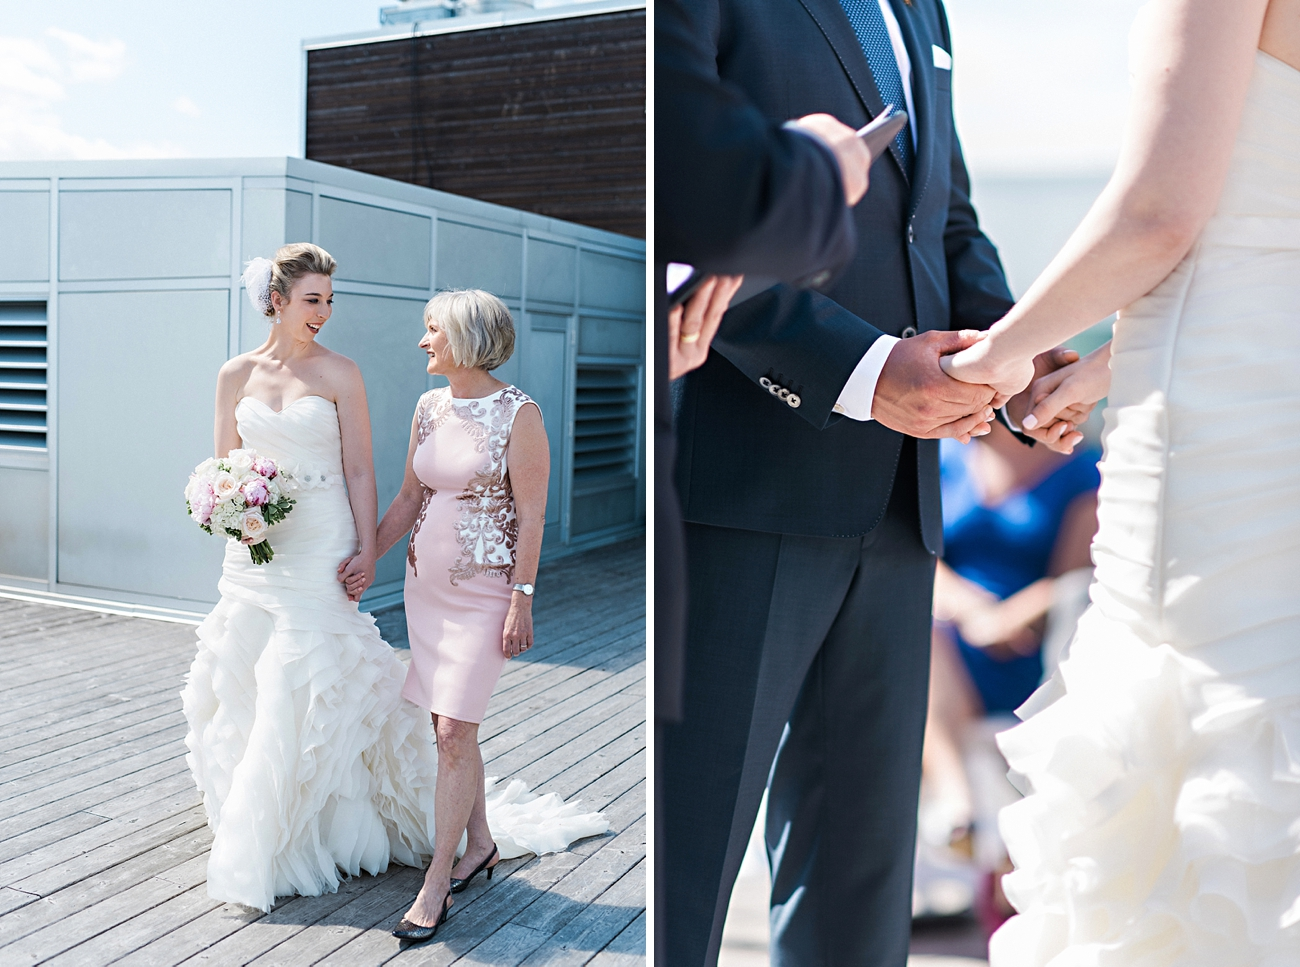 Sara-Seans-Halifax-Prince-George-Hotel-Wedding027.jpg